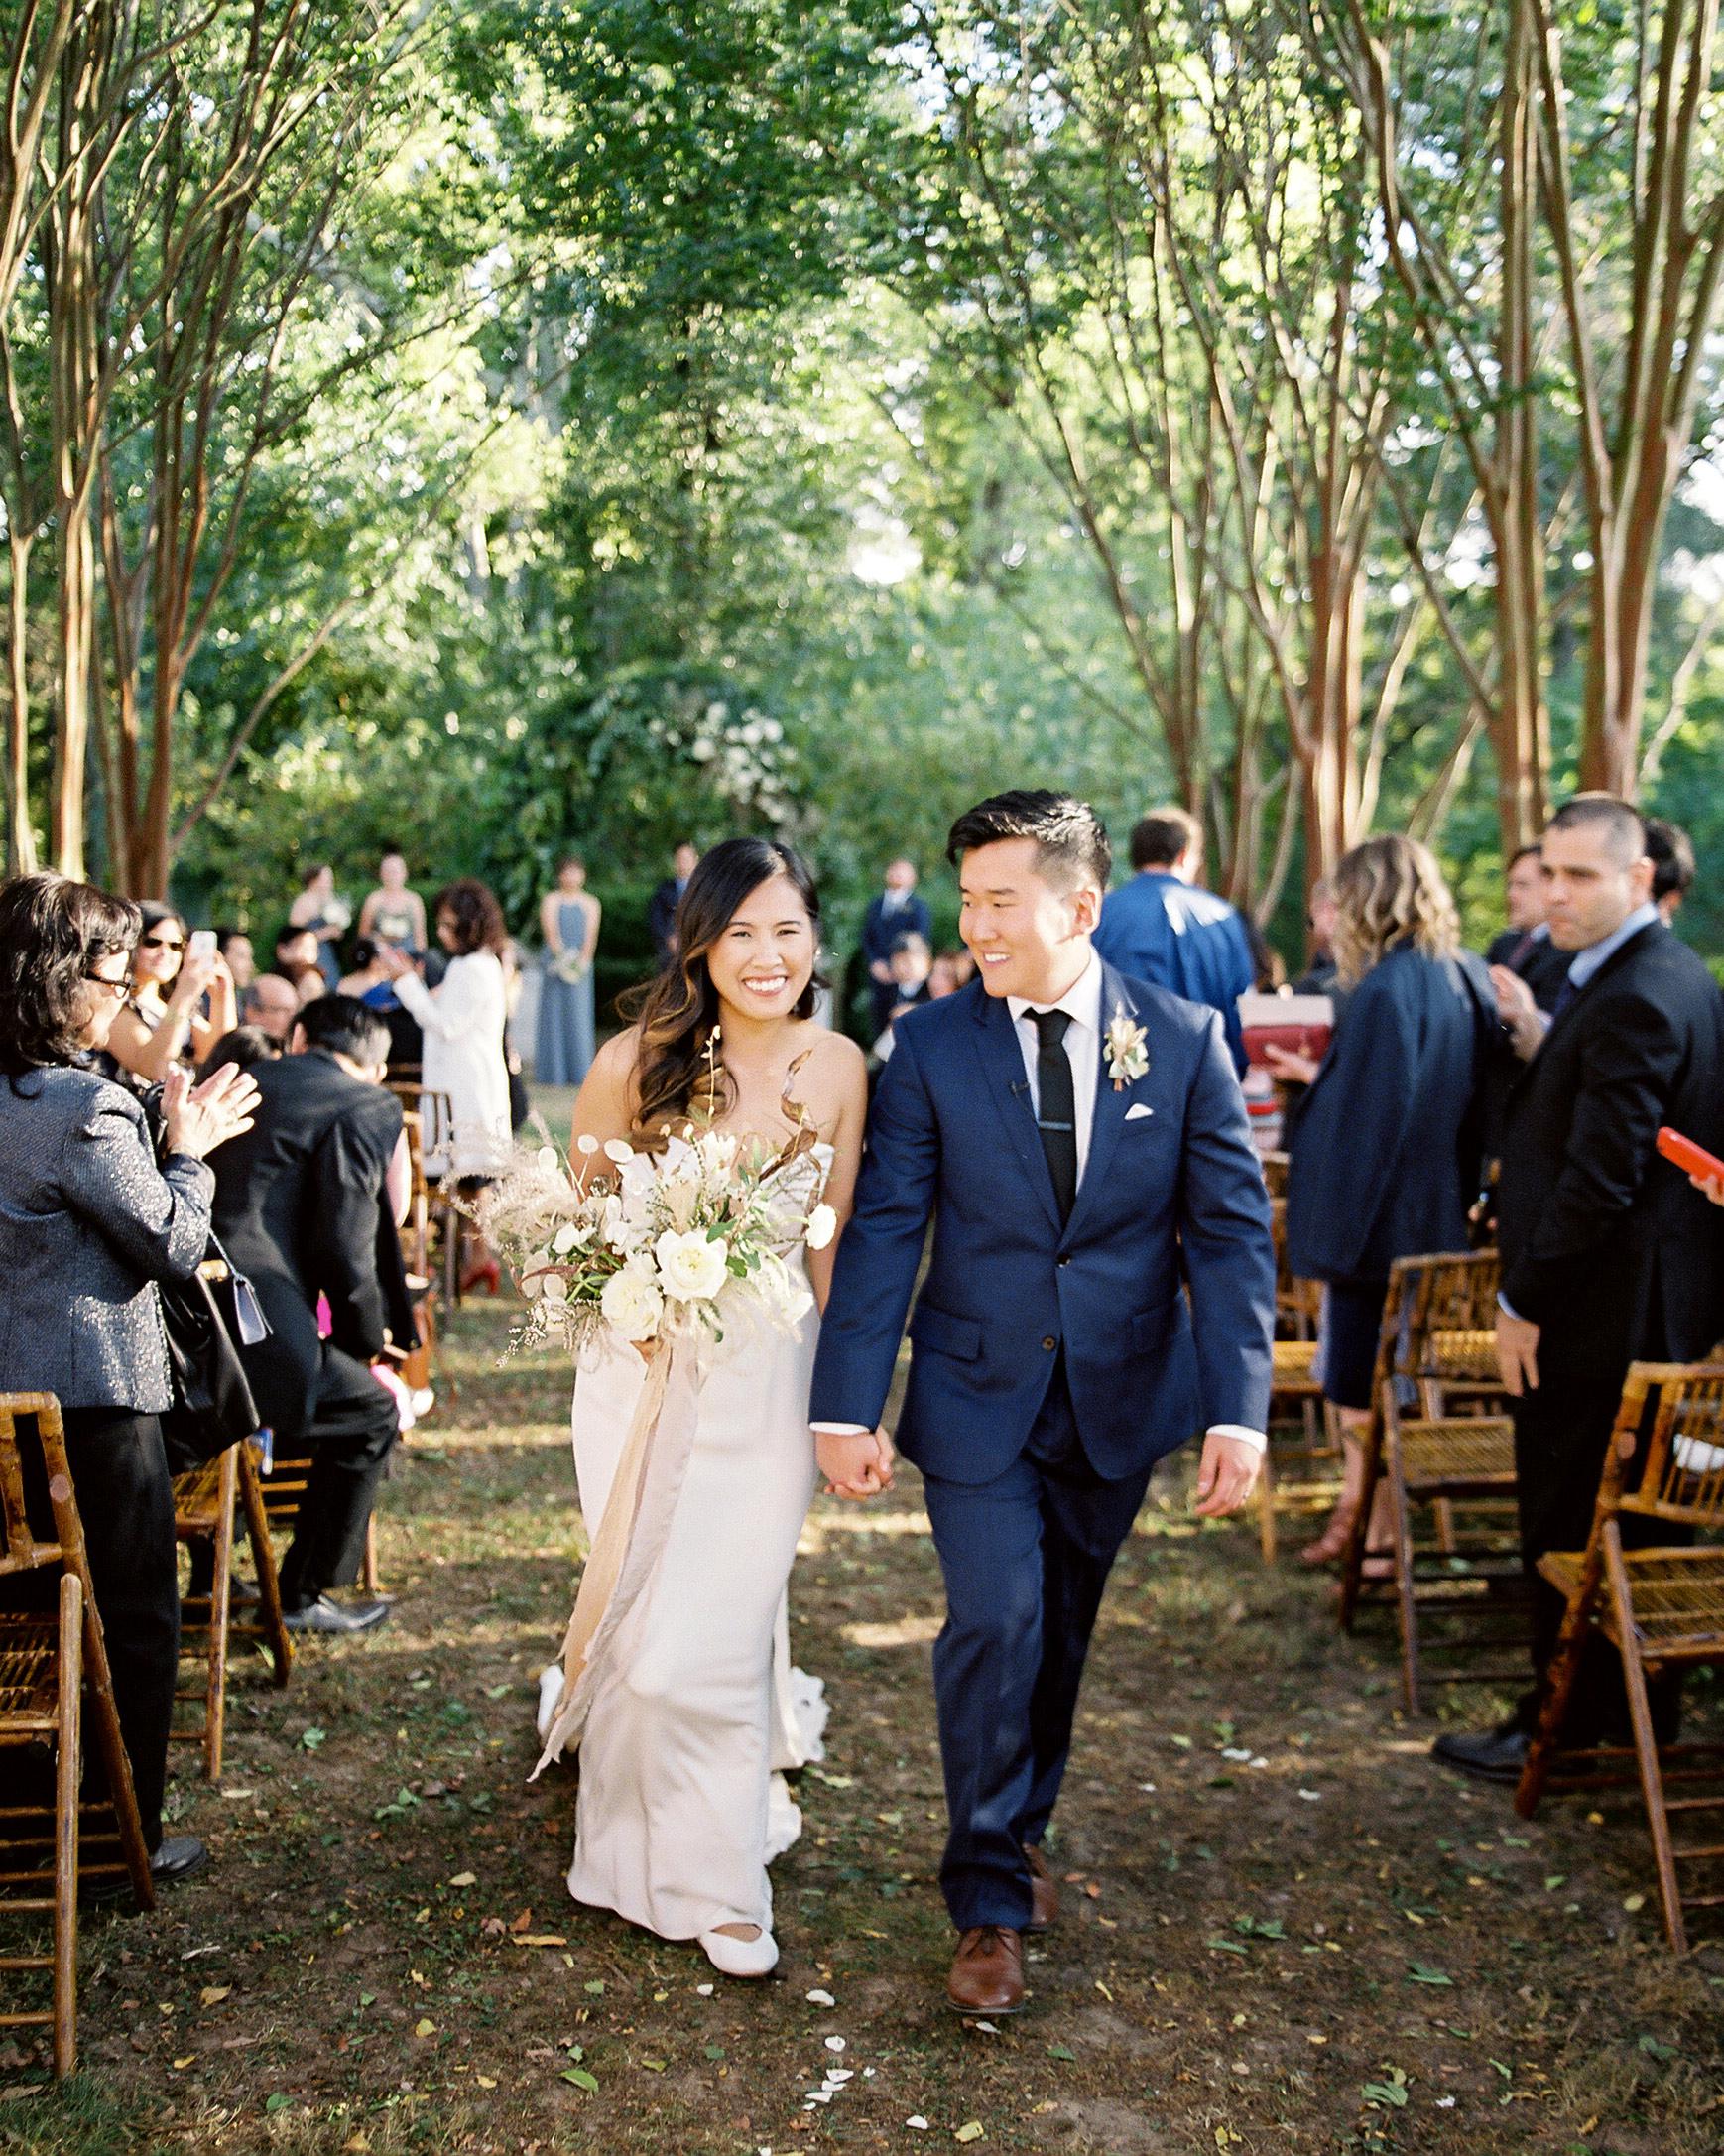 linda robert wedding ceremony recessional